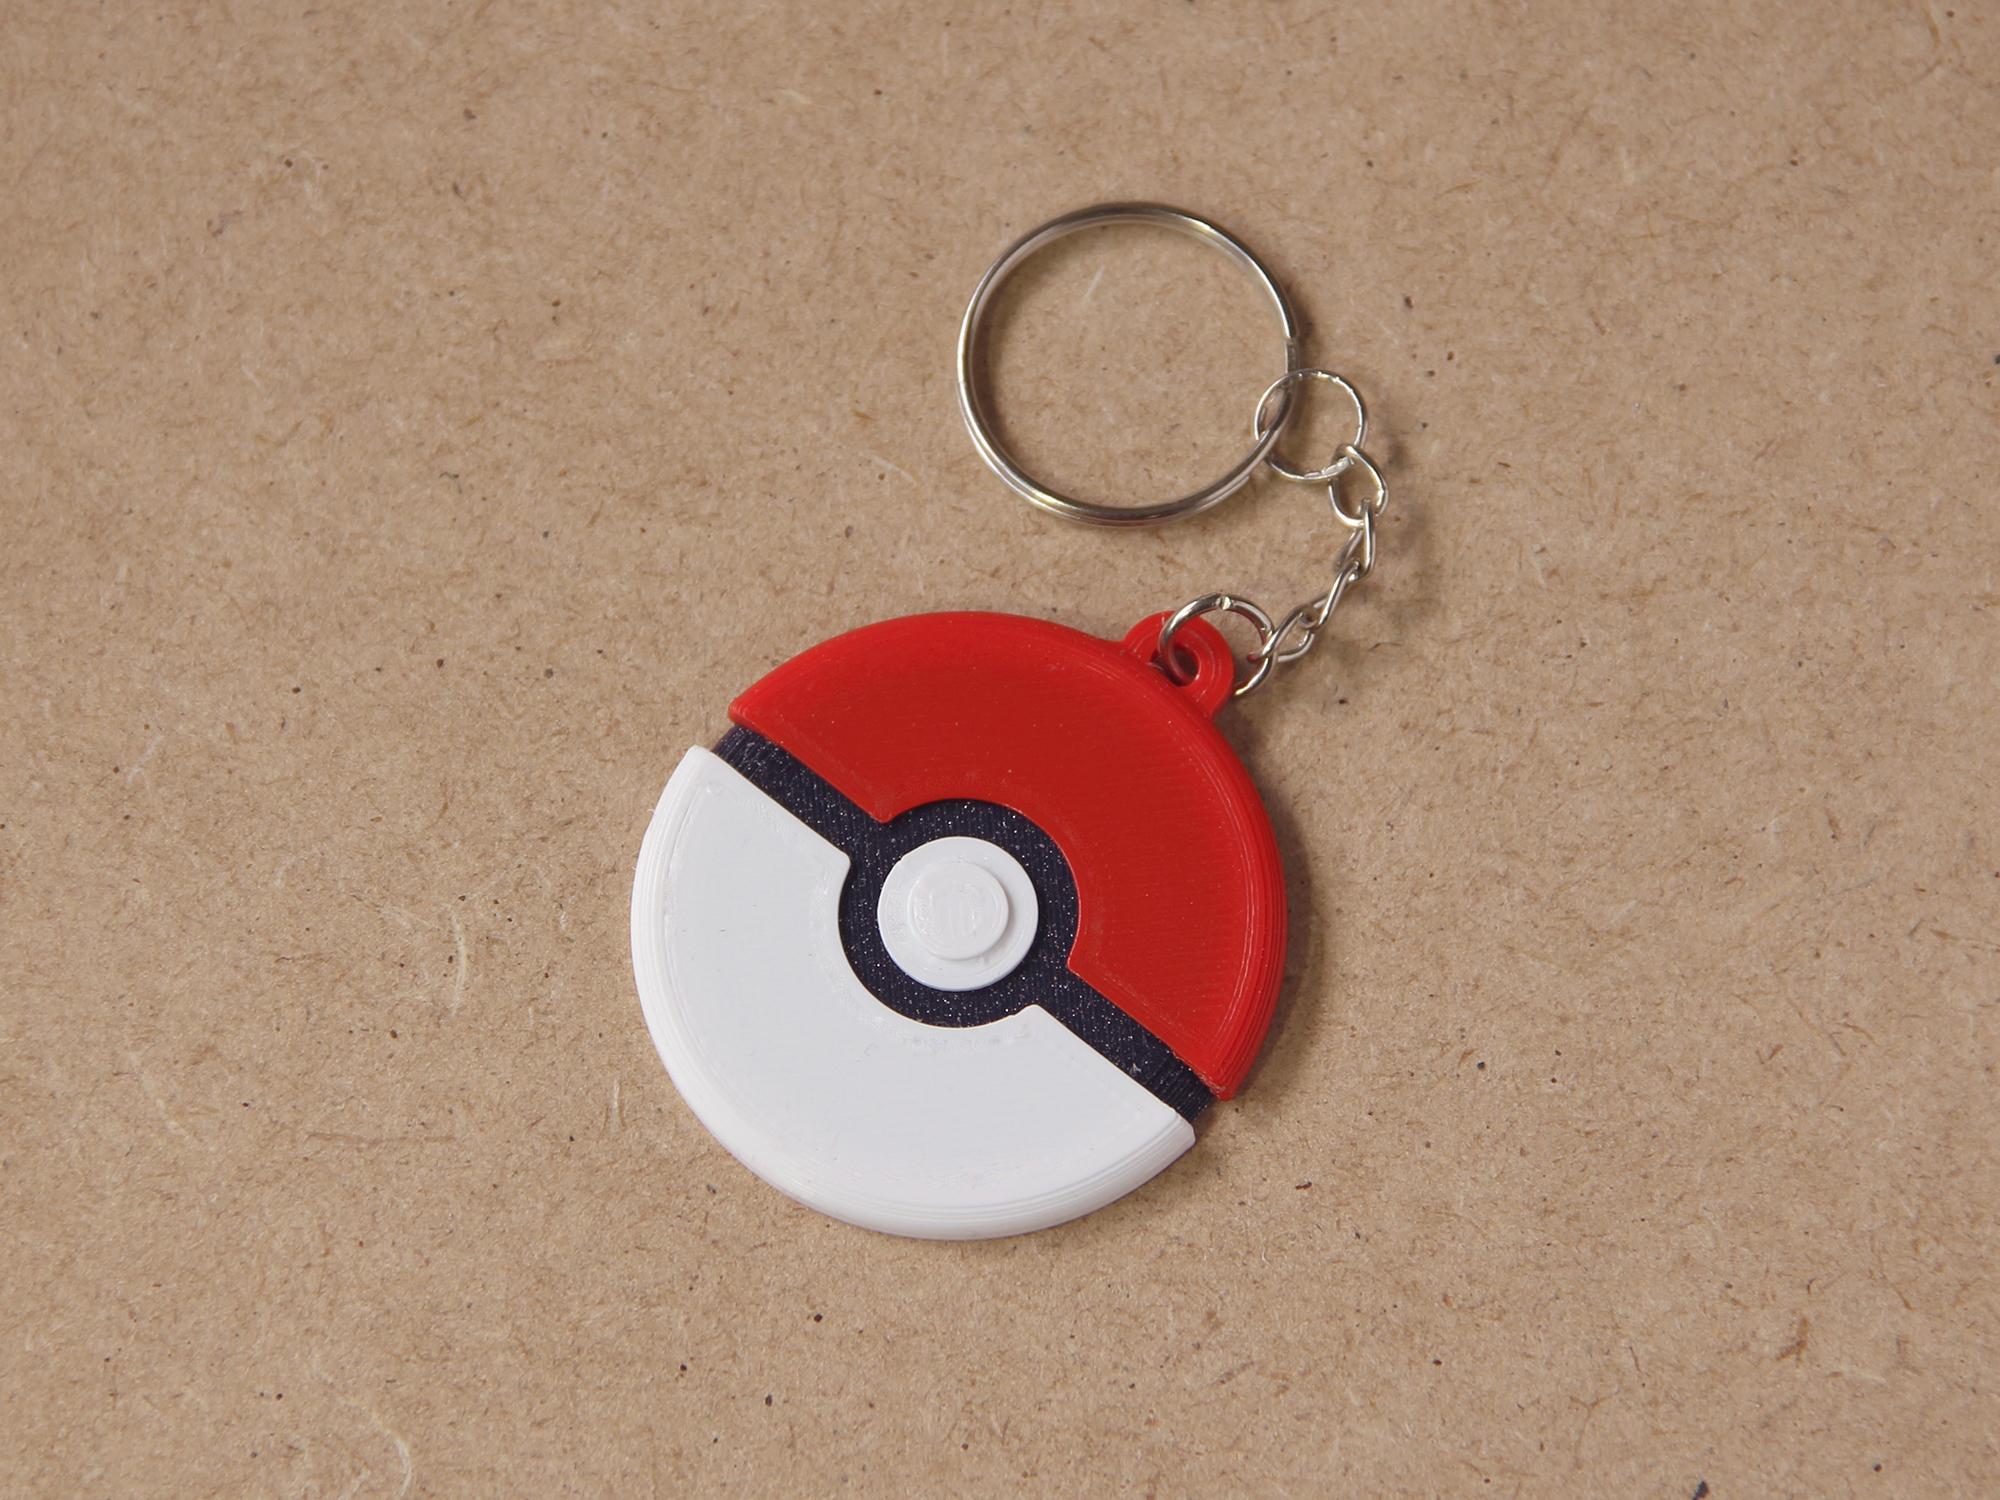 Miniaturas thingiverse 01.jpg Download free STL file Keychain Multicolor Pokemon • 3D printer template, dukedoks